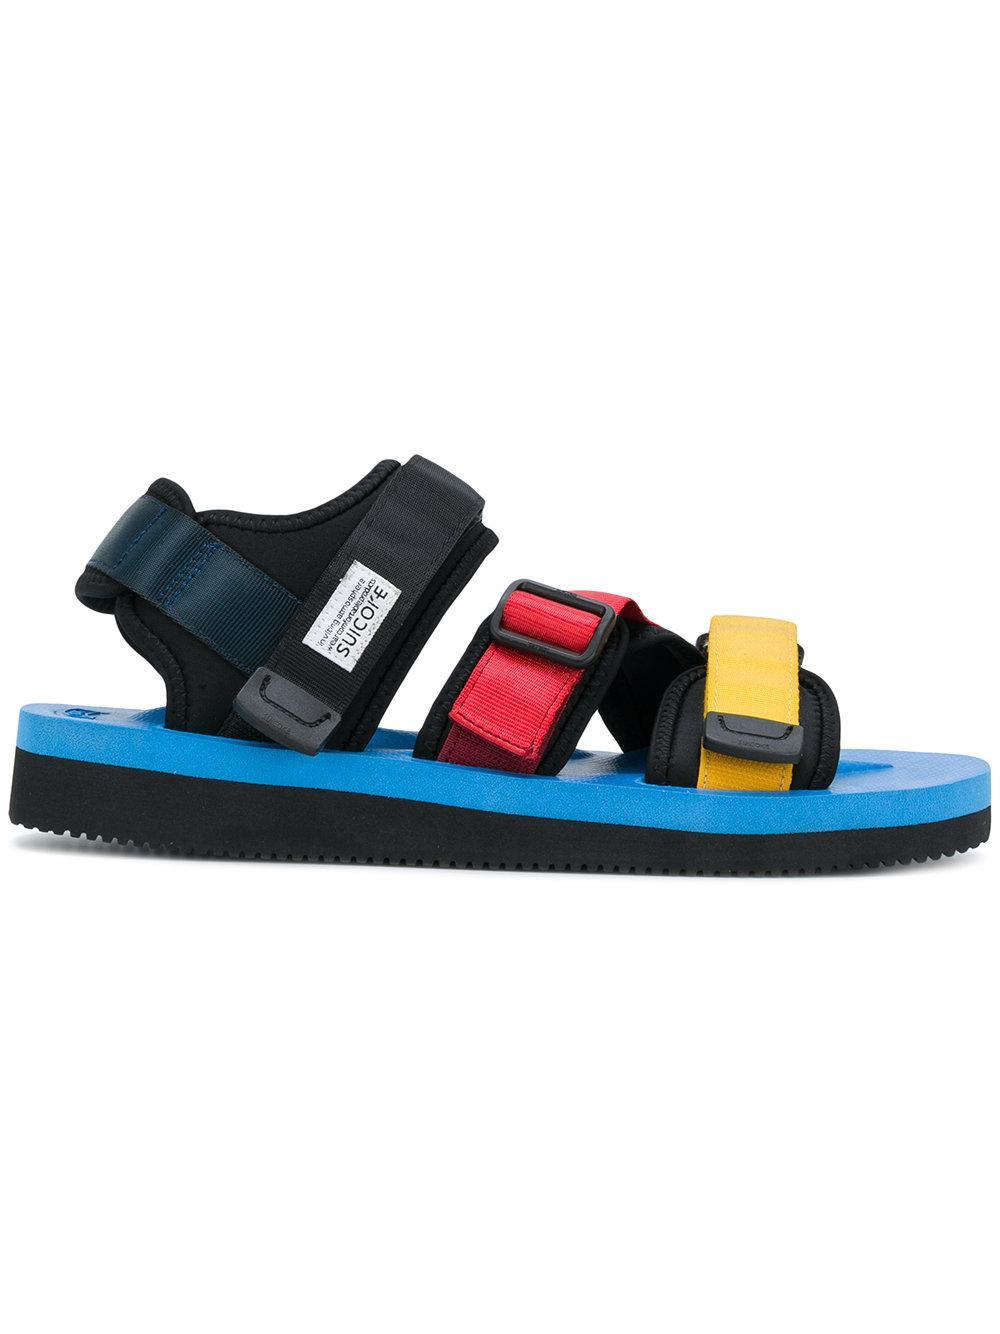 10746d40c815 Suicoke Kisee-V Sandals In Multicolour. Farfetch